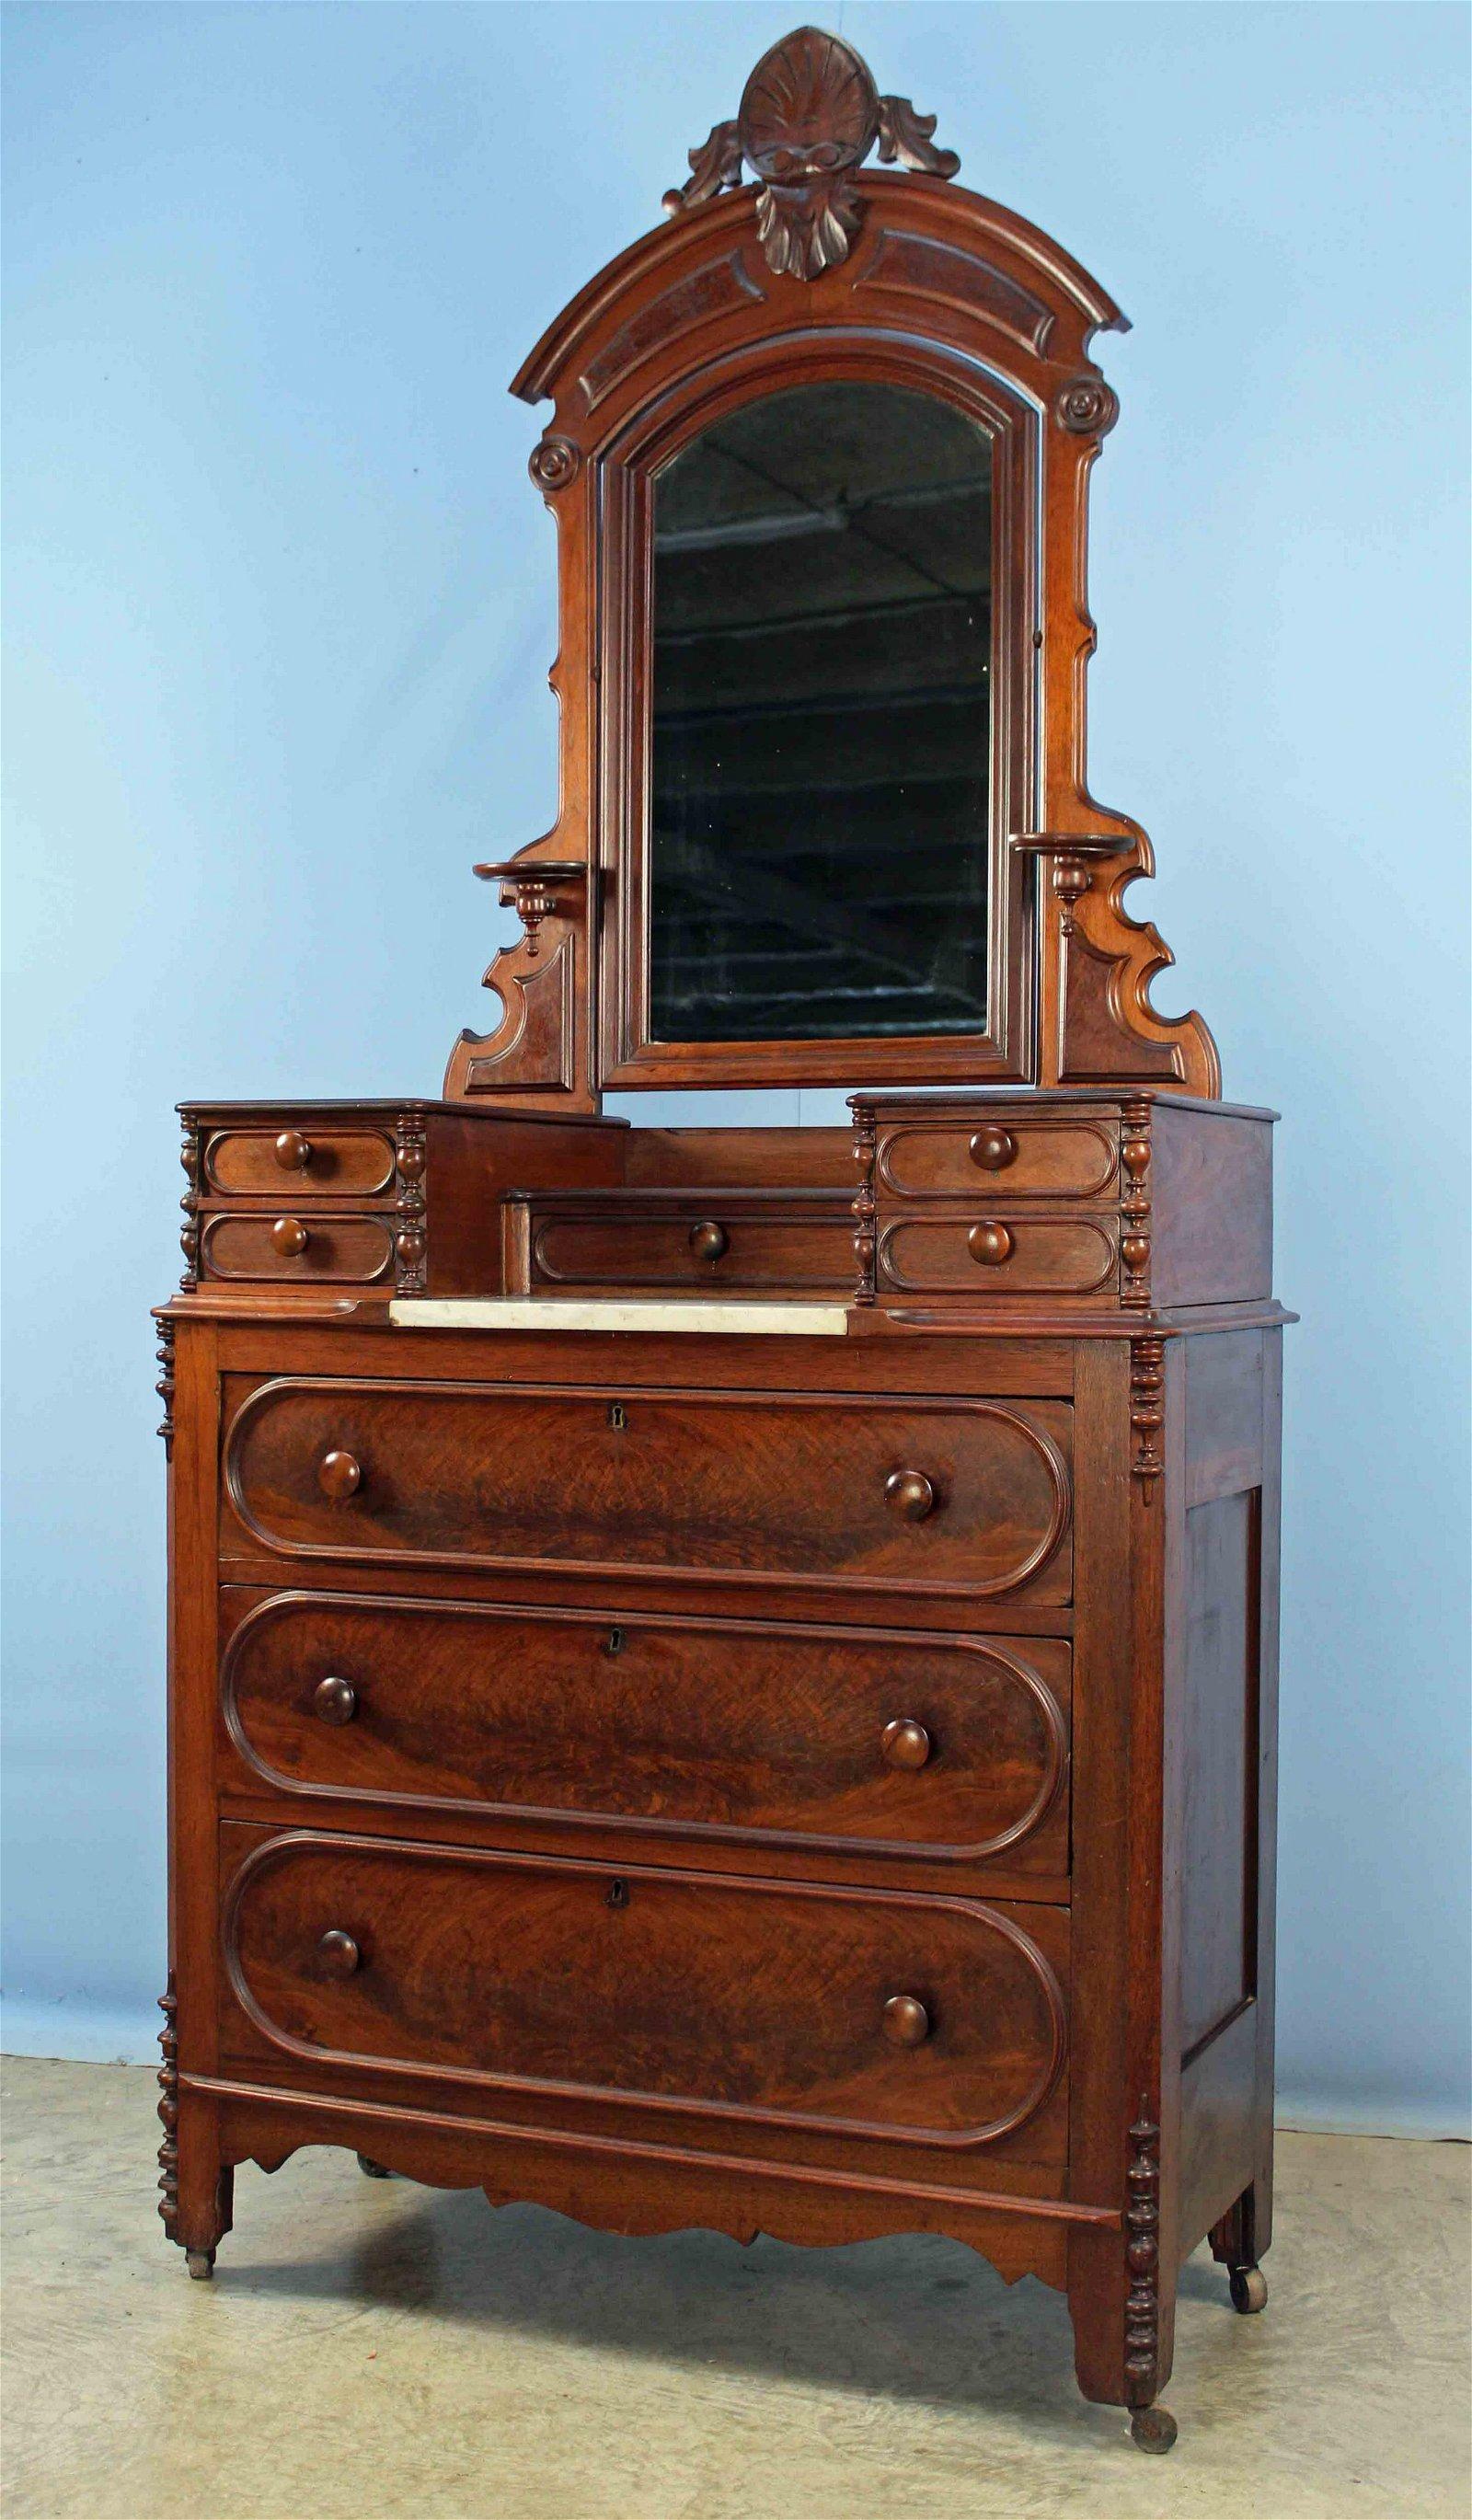 C. 1875 Walnut and Crotch Mahogany Dresser